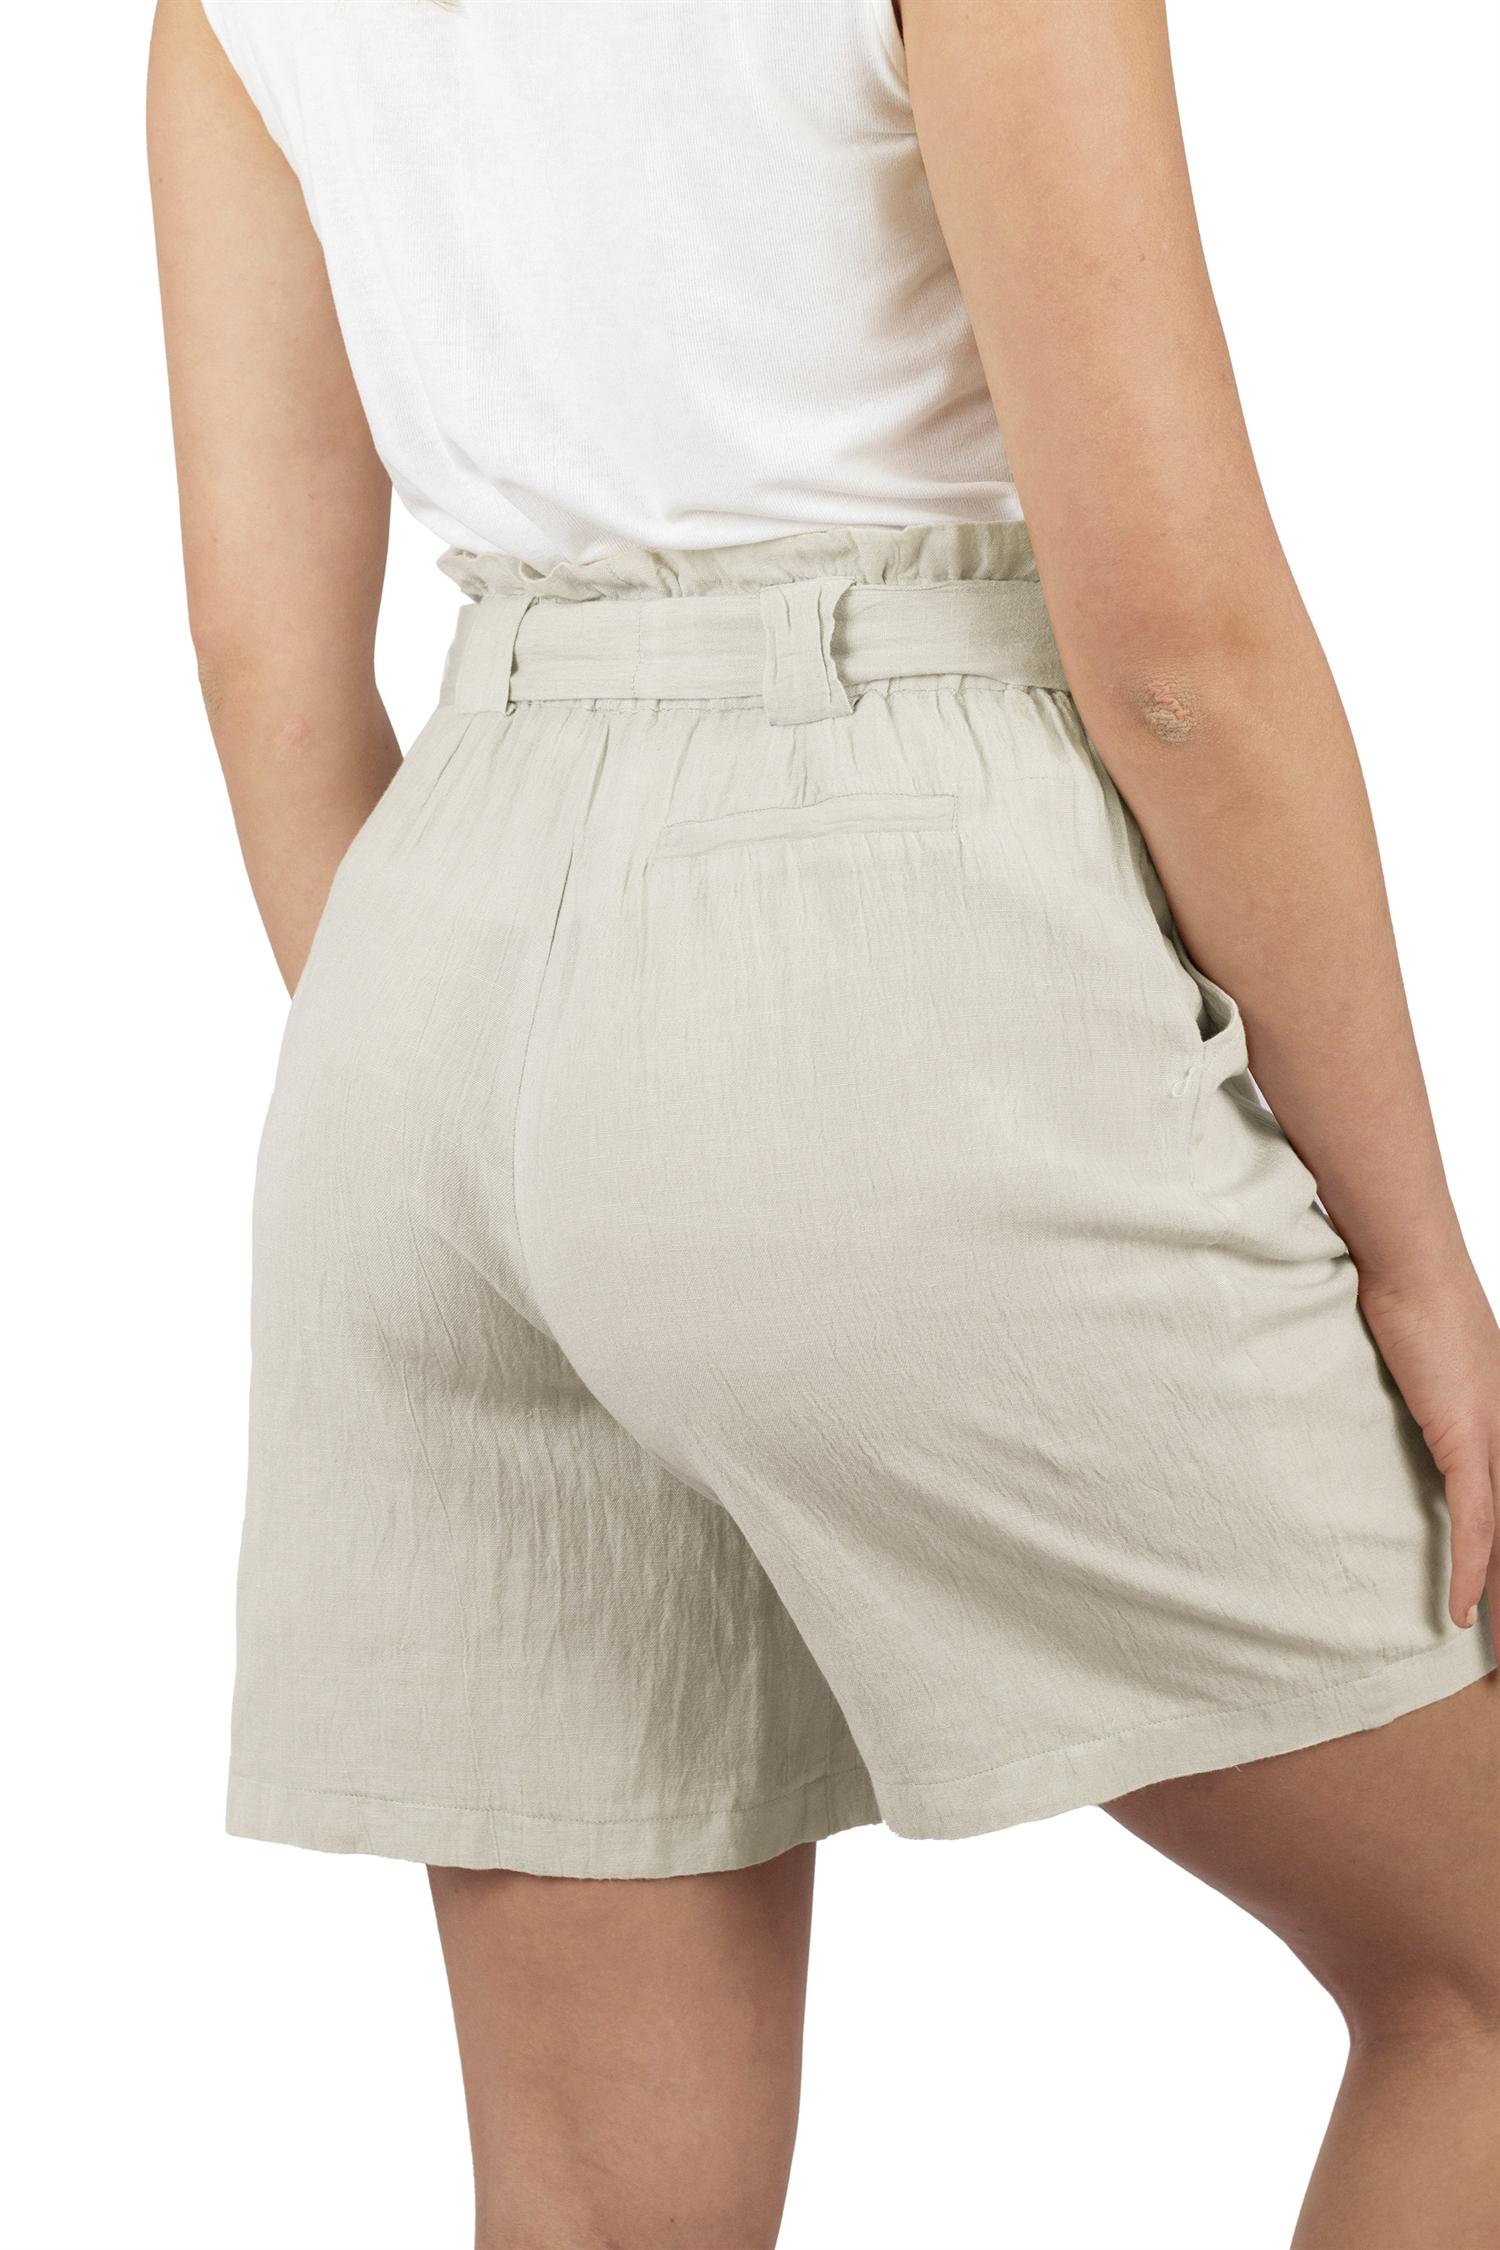 Thalia shorts, sand